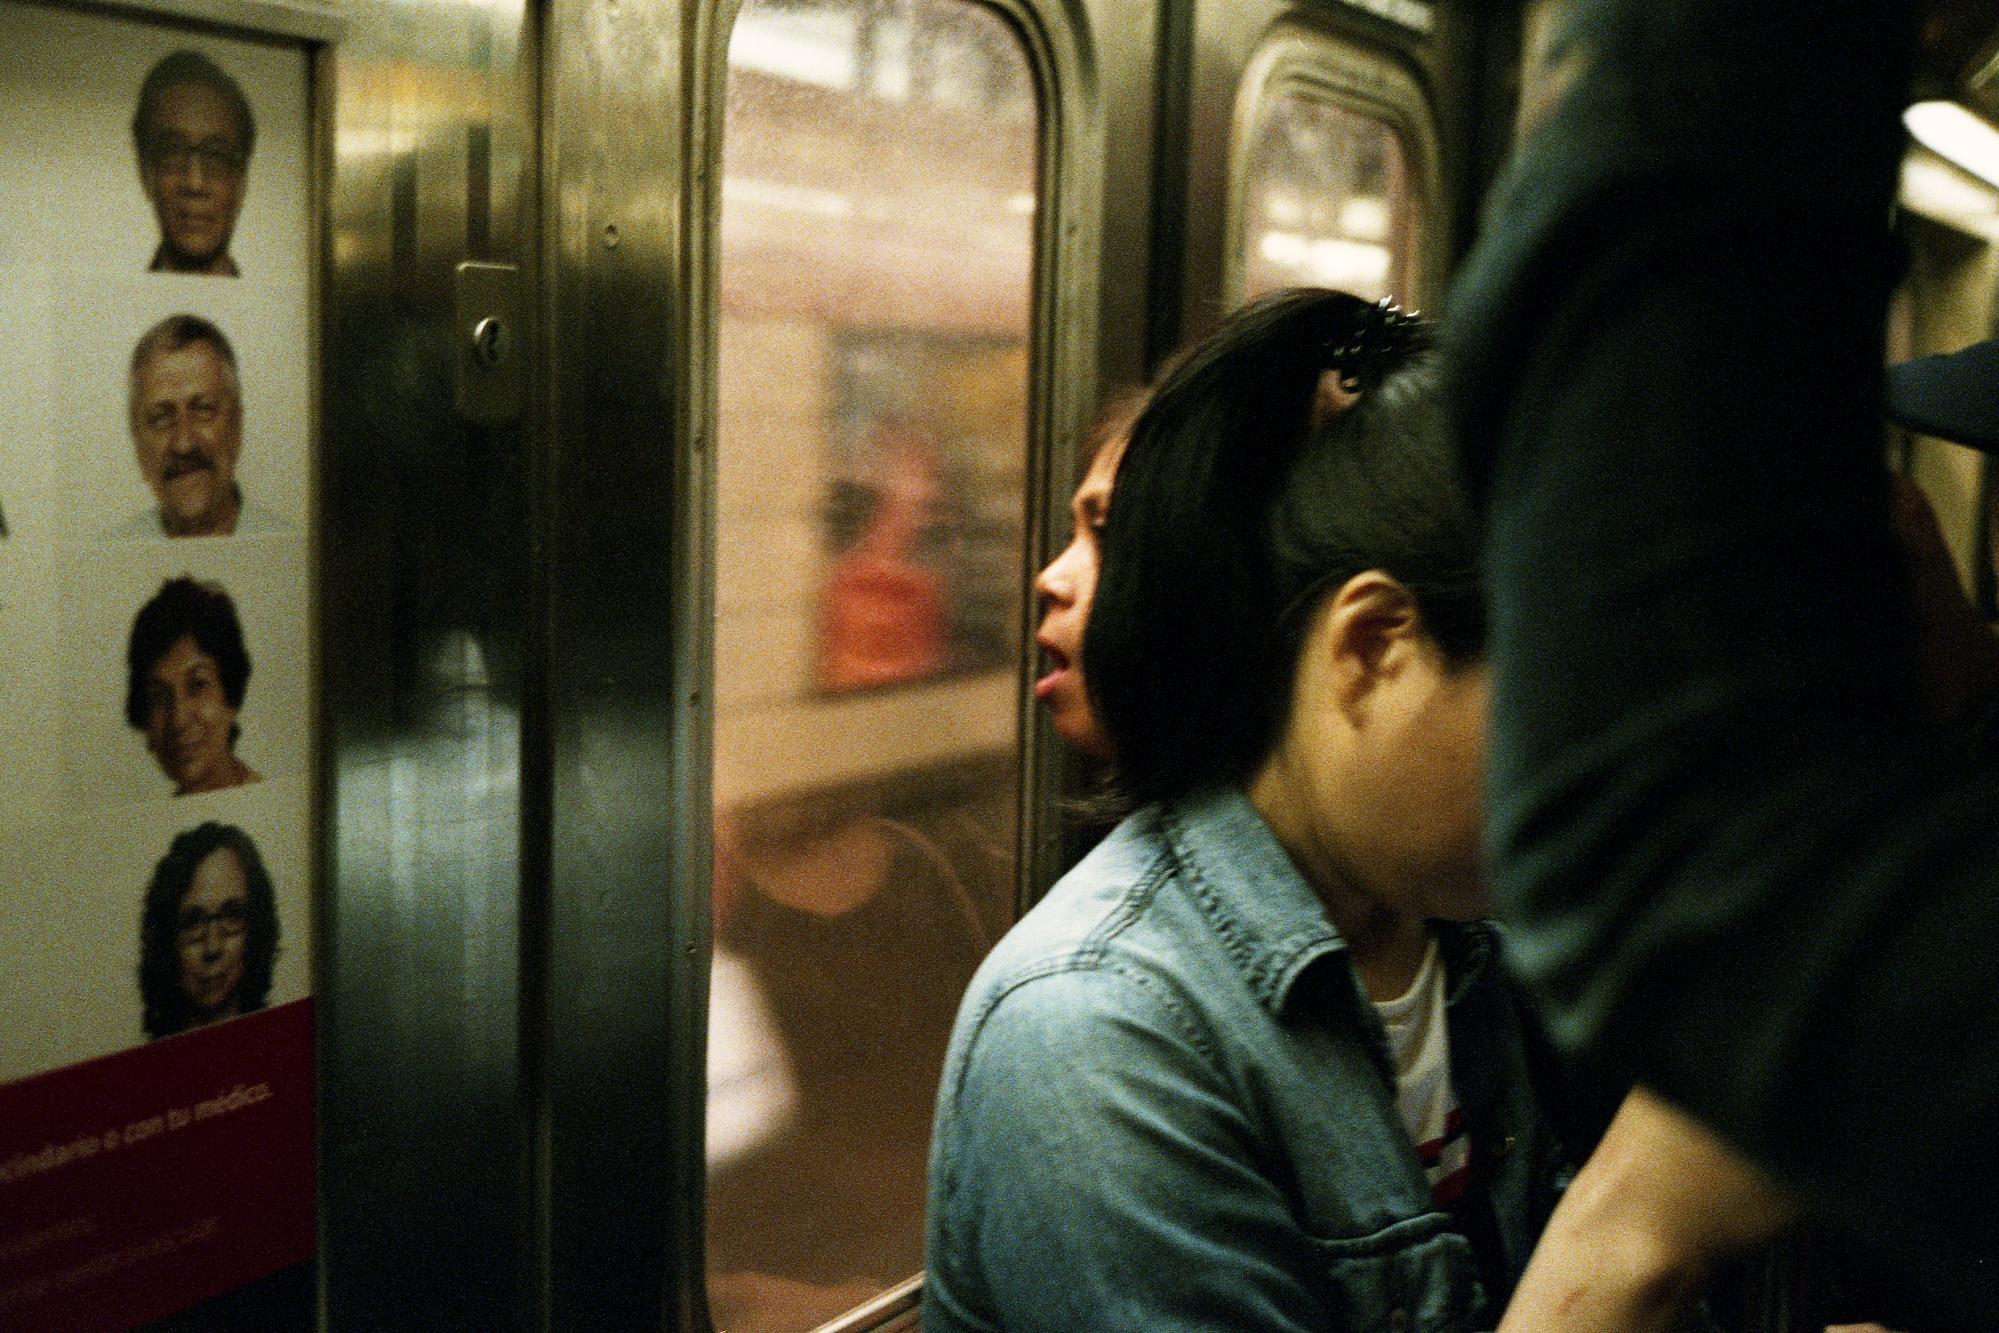 NYC_35mm_00085.jpg